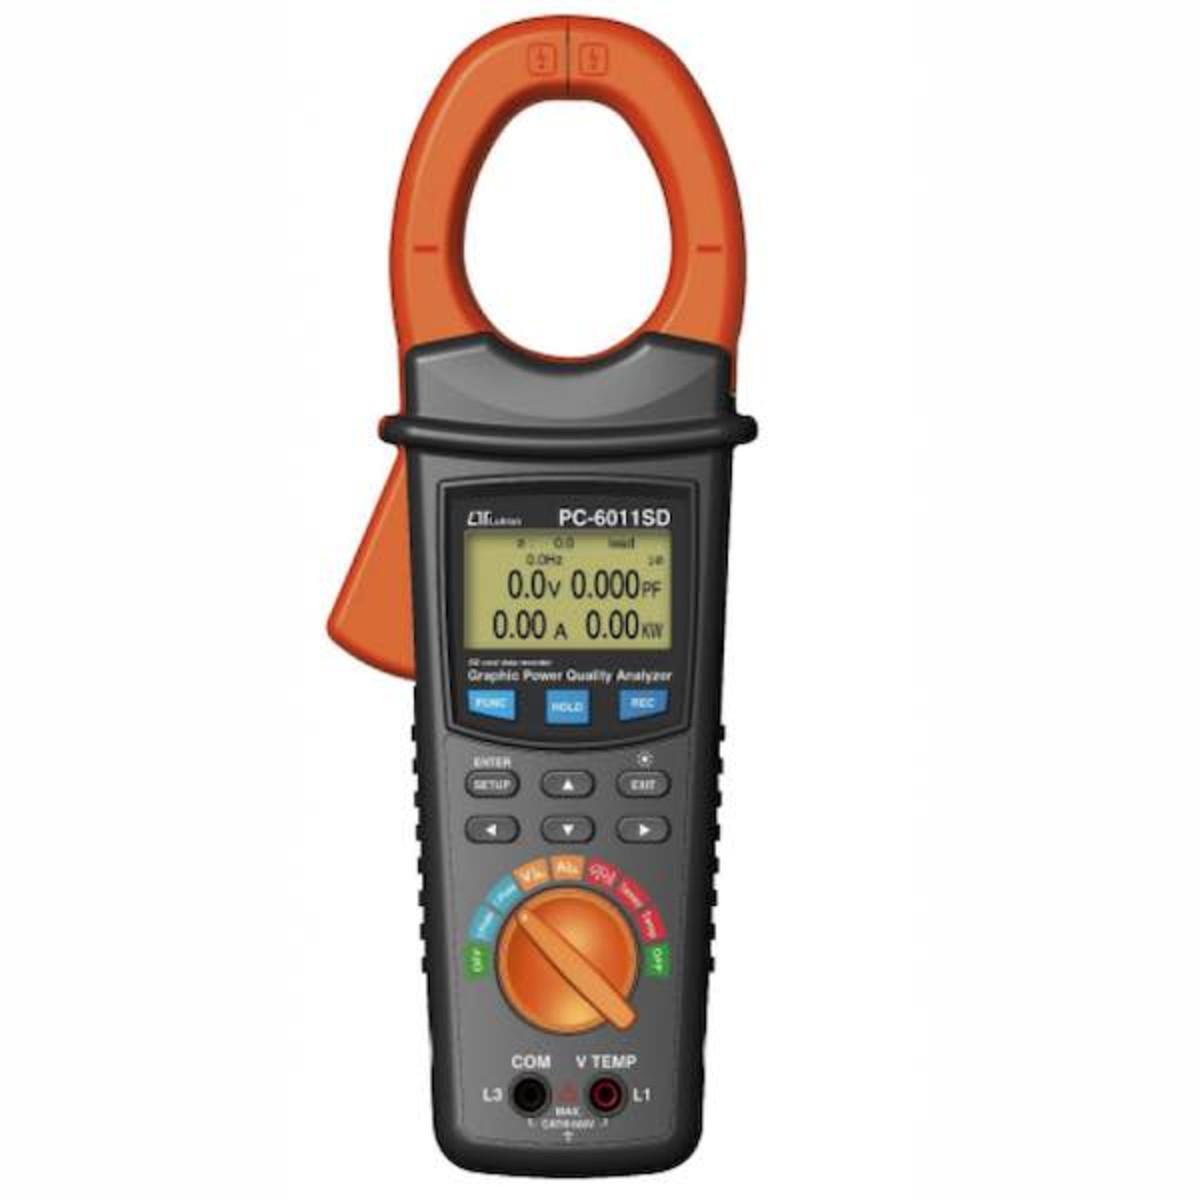 Lutron PC-6011SD Clamp power analyser